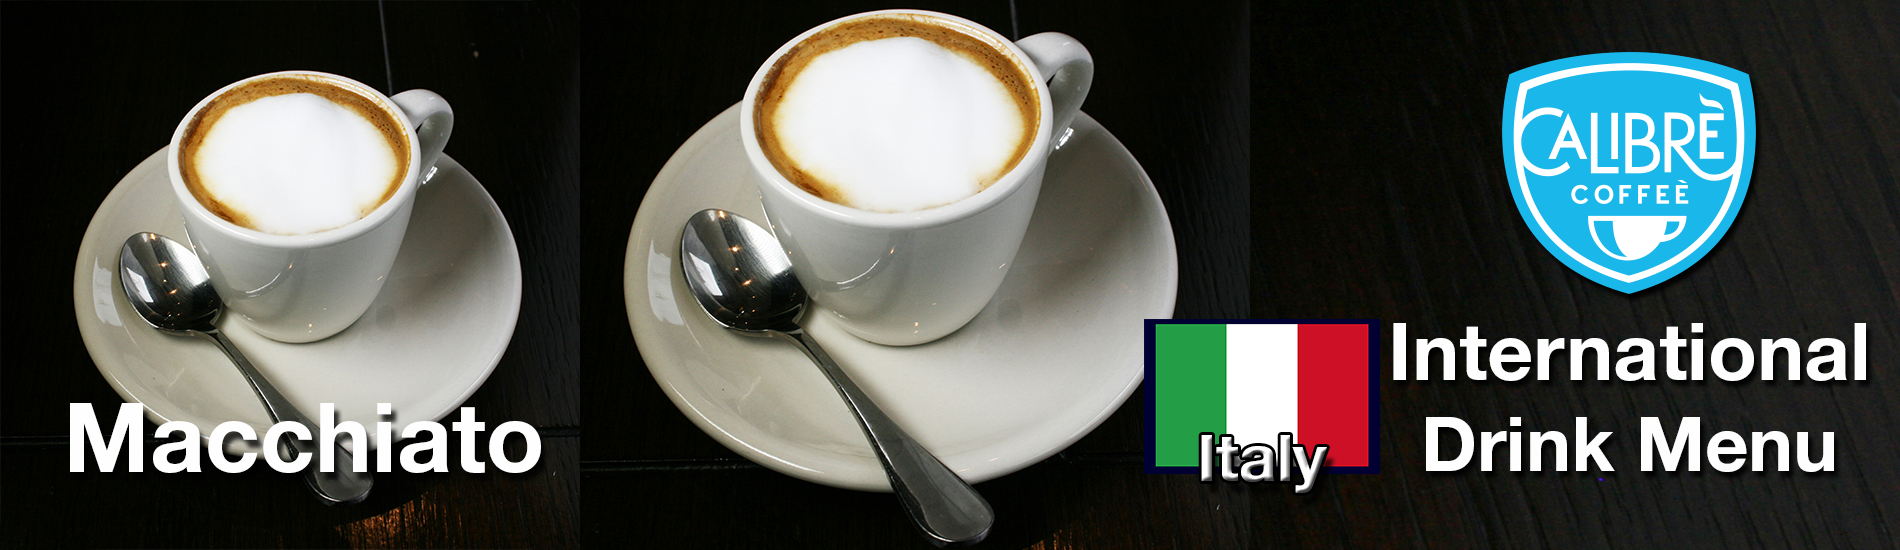 calibre-coffee-slides-international-coffee-Macchiato2